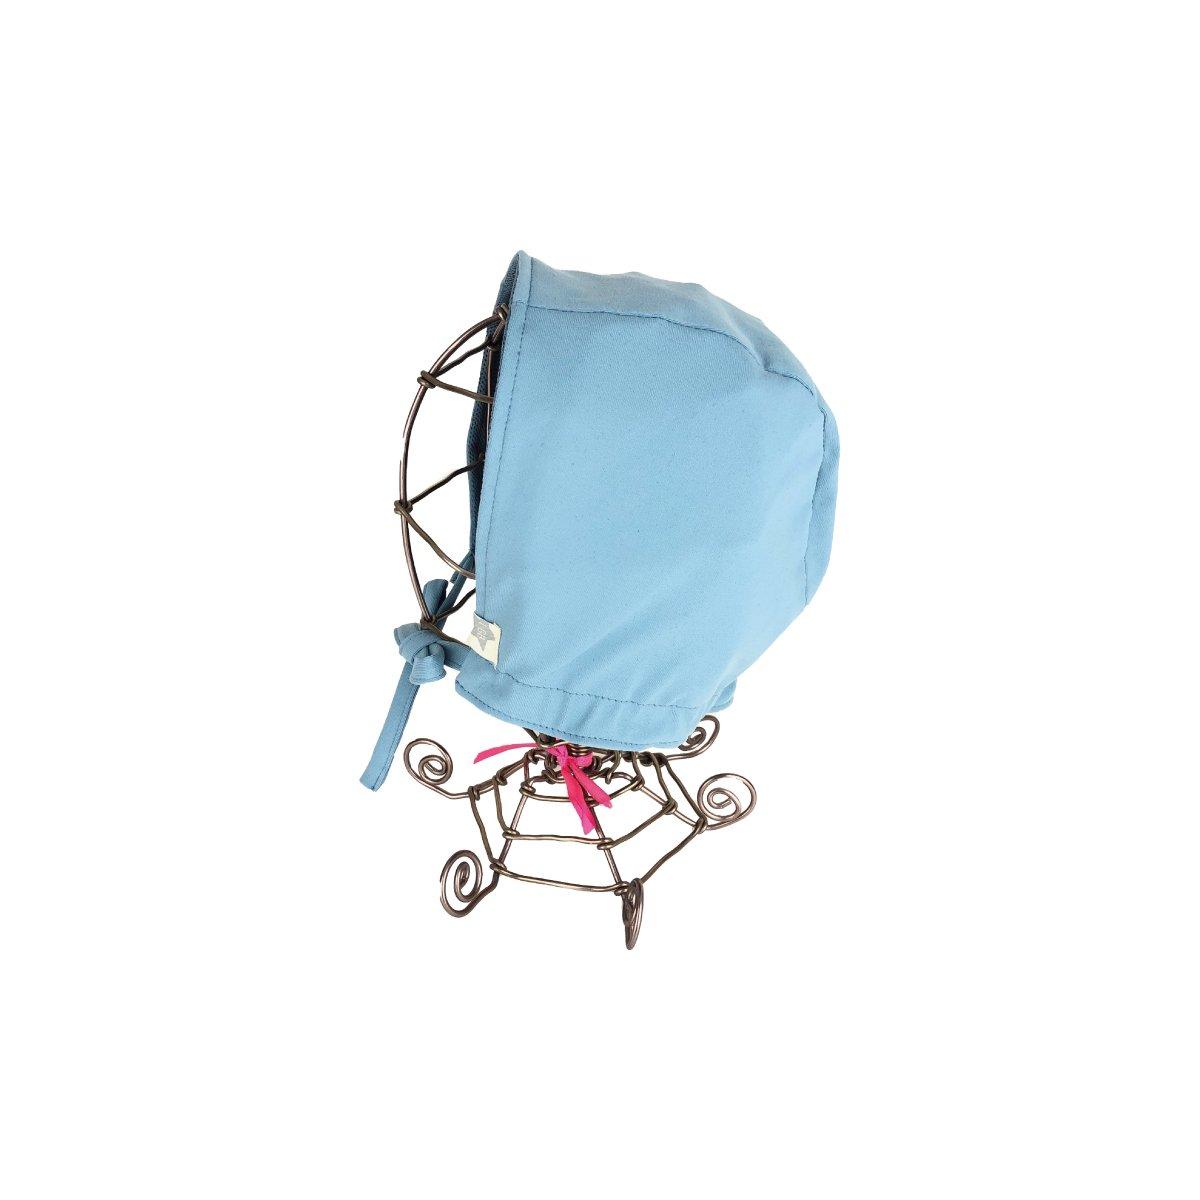 【BABY】Candy Bonnet 詳細画像9